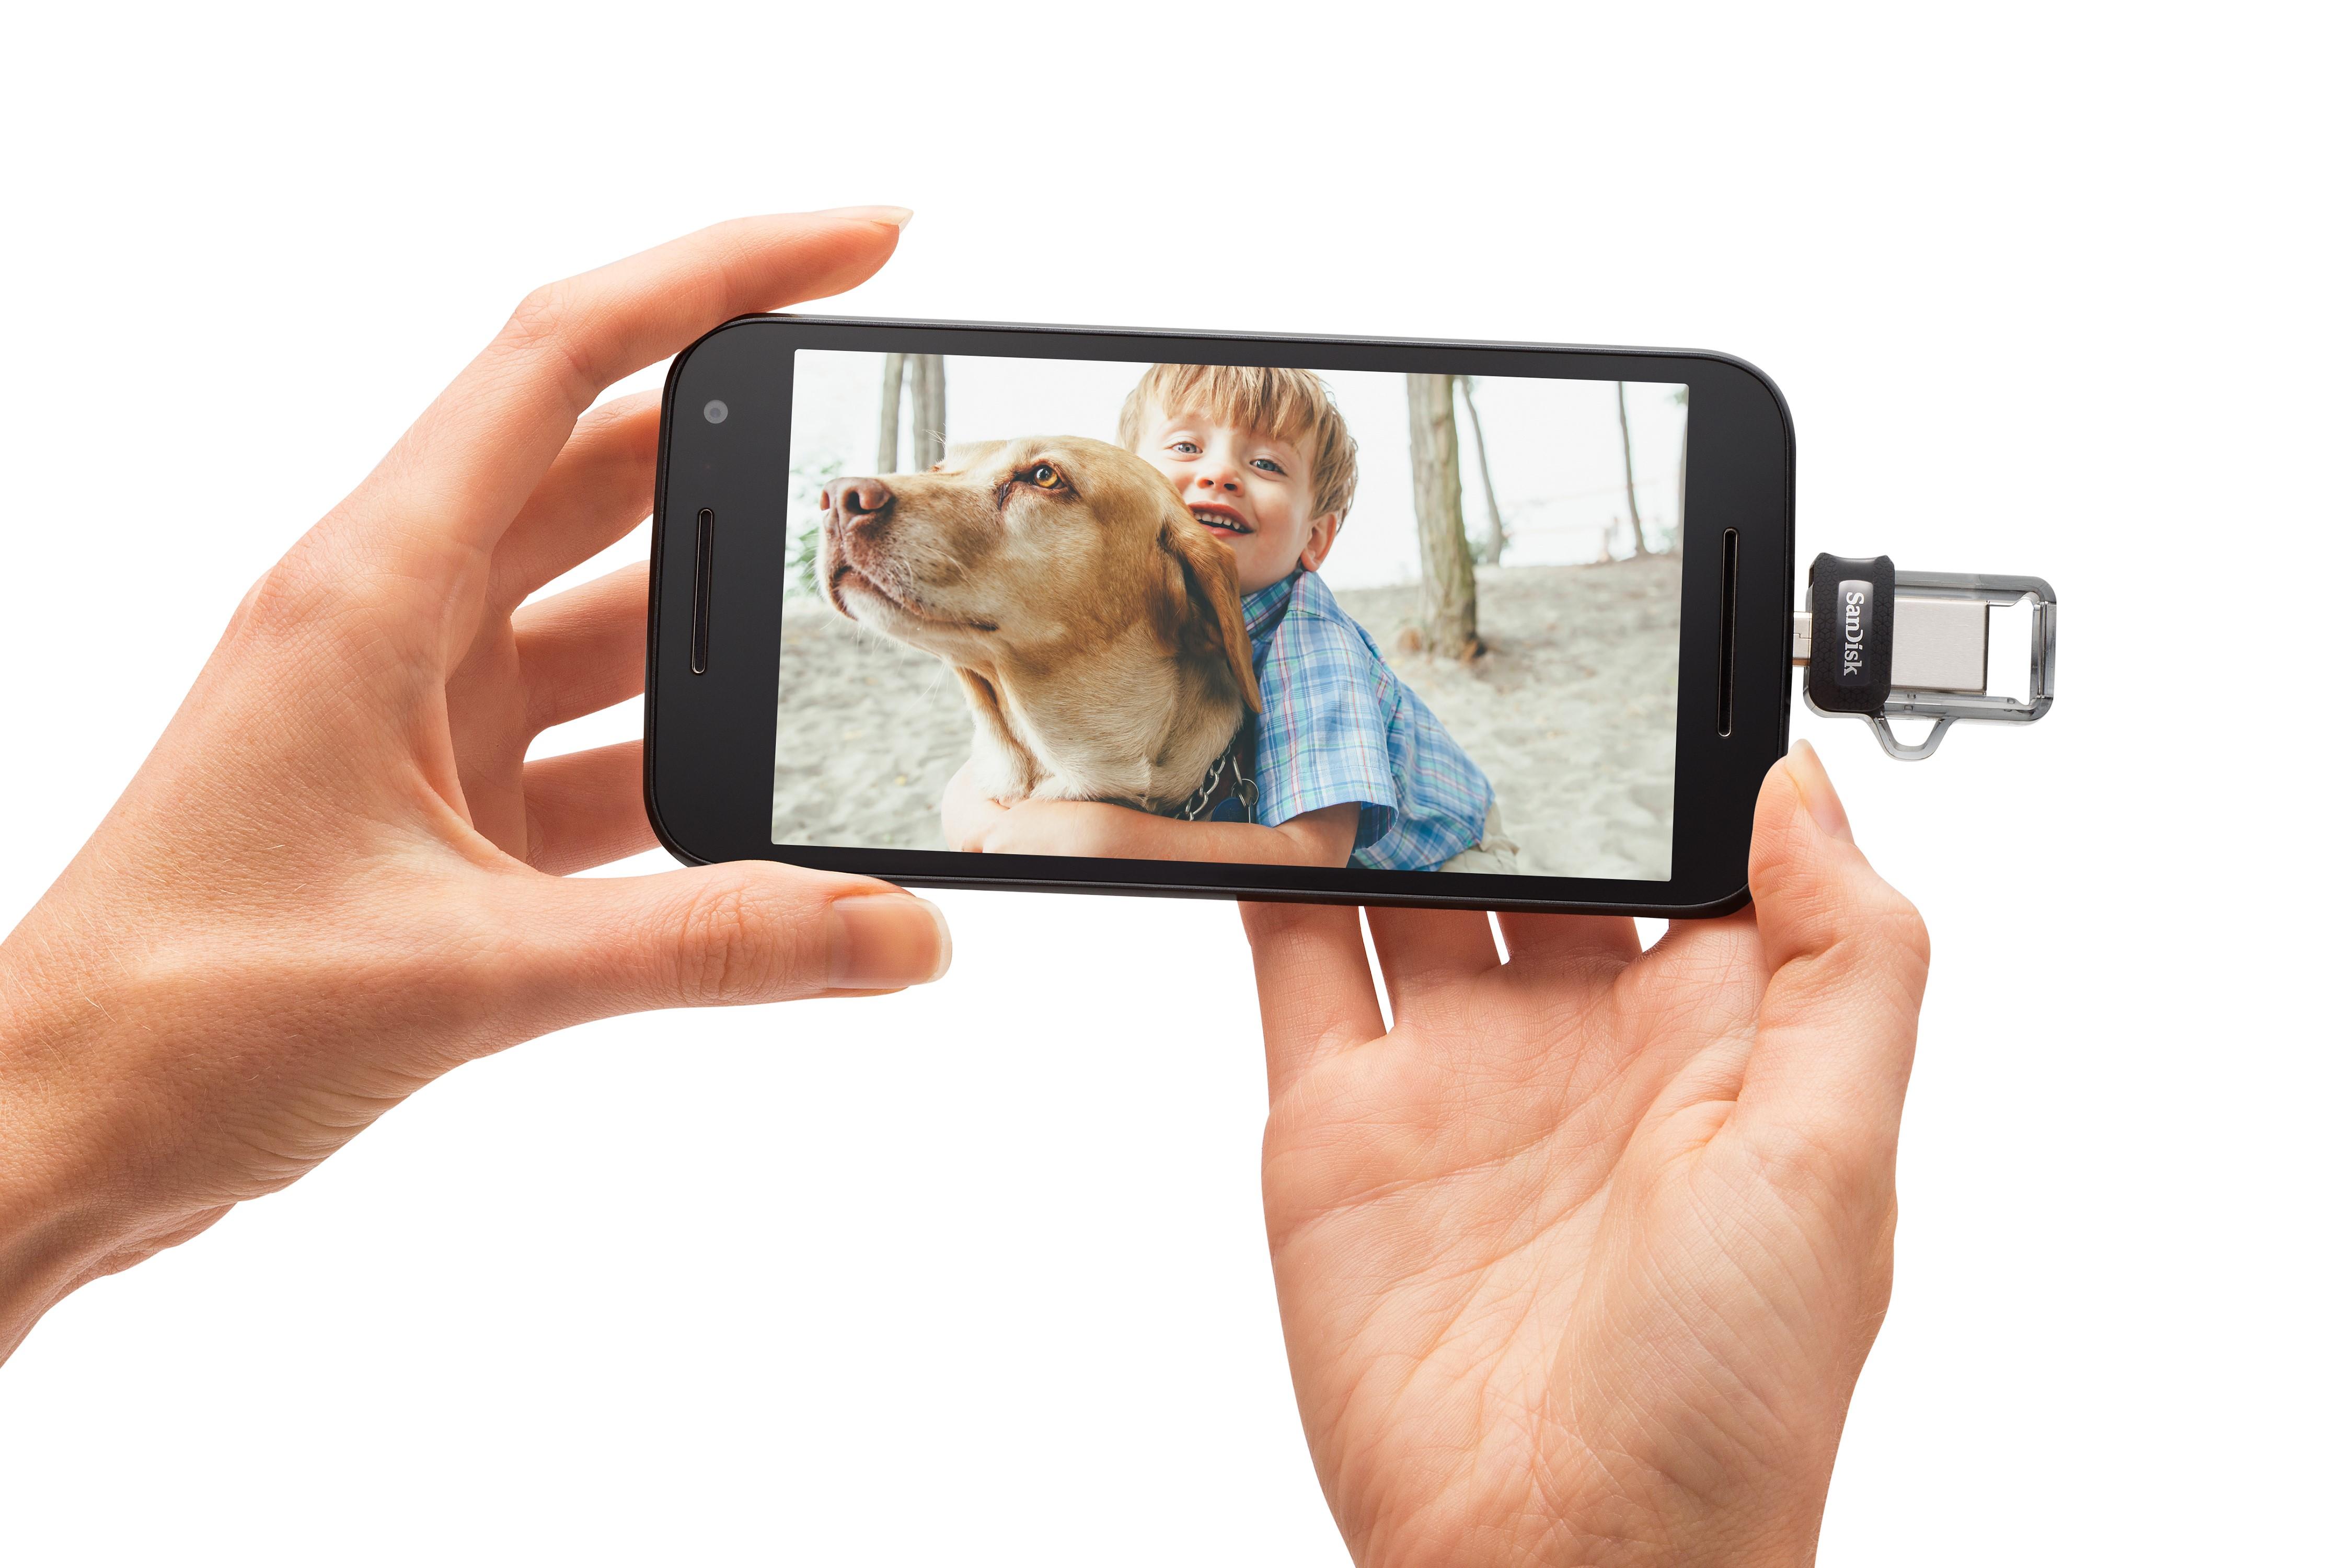 Western Digital ra mắt thiết bị USB mới SanDisk Ultra Dual Drive m3.0